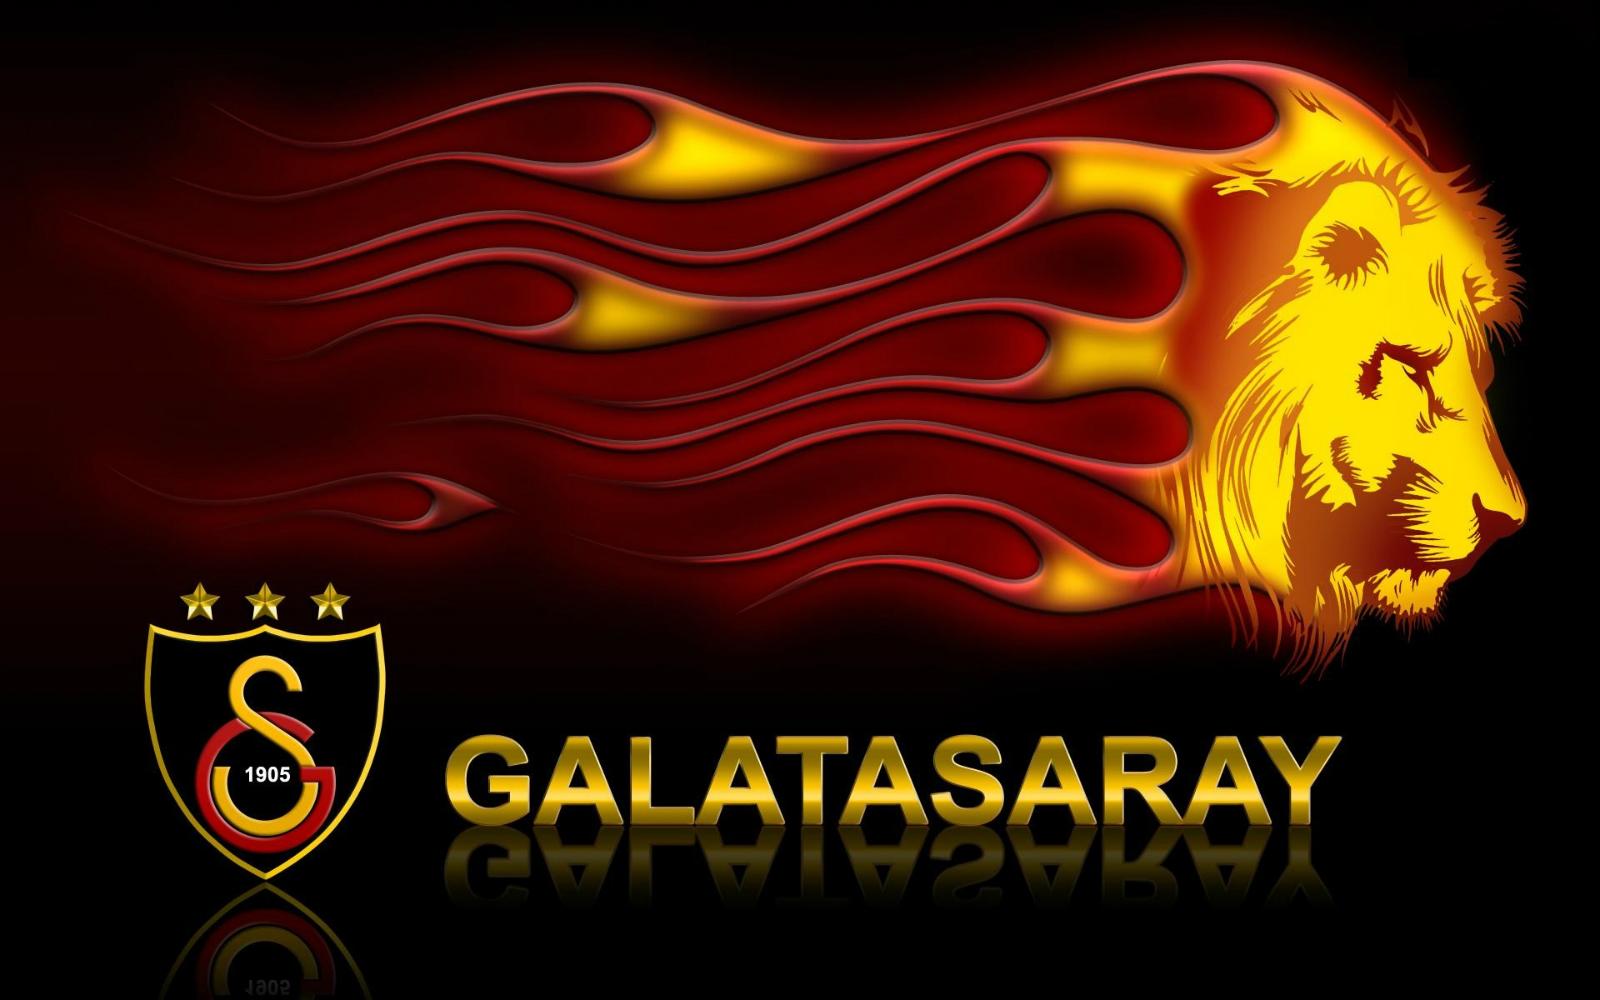 Central Wallpaper: Galatasaray FC HD Wallpapers & Logos